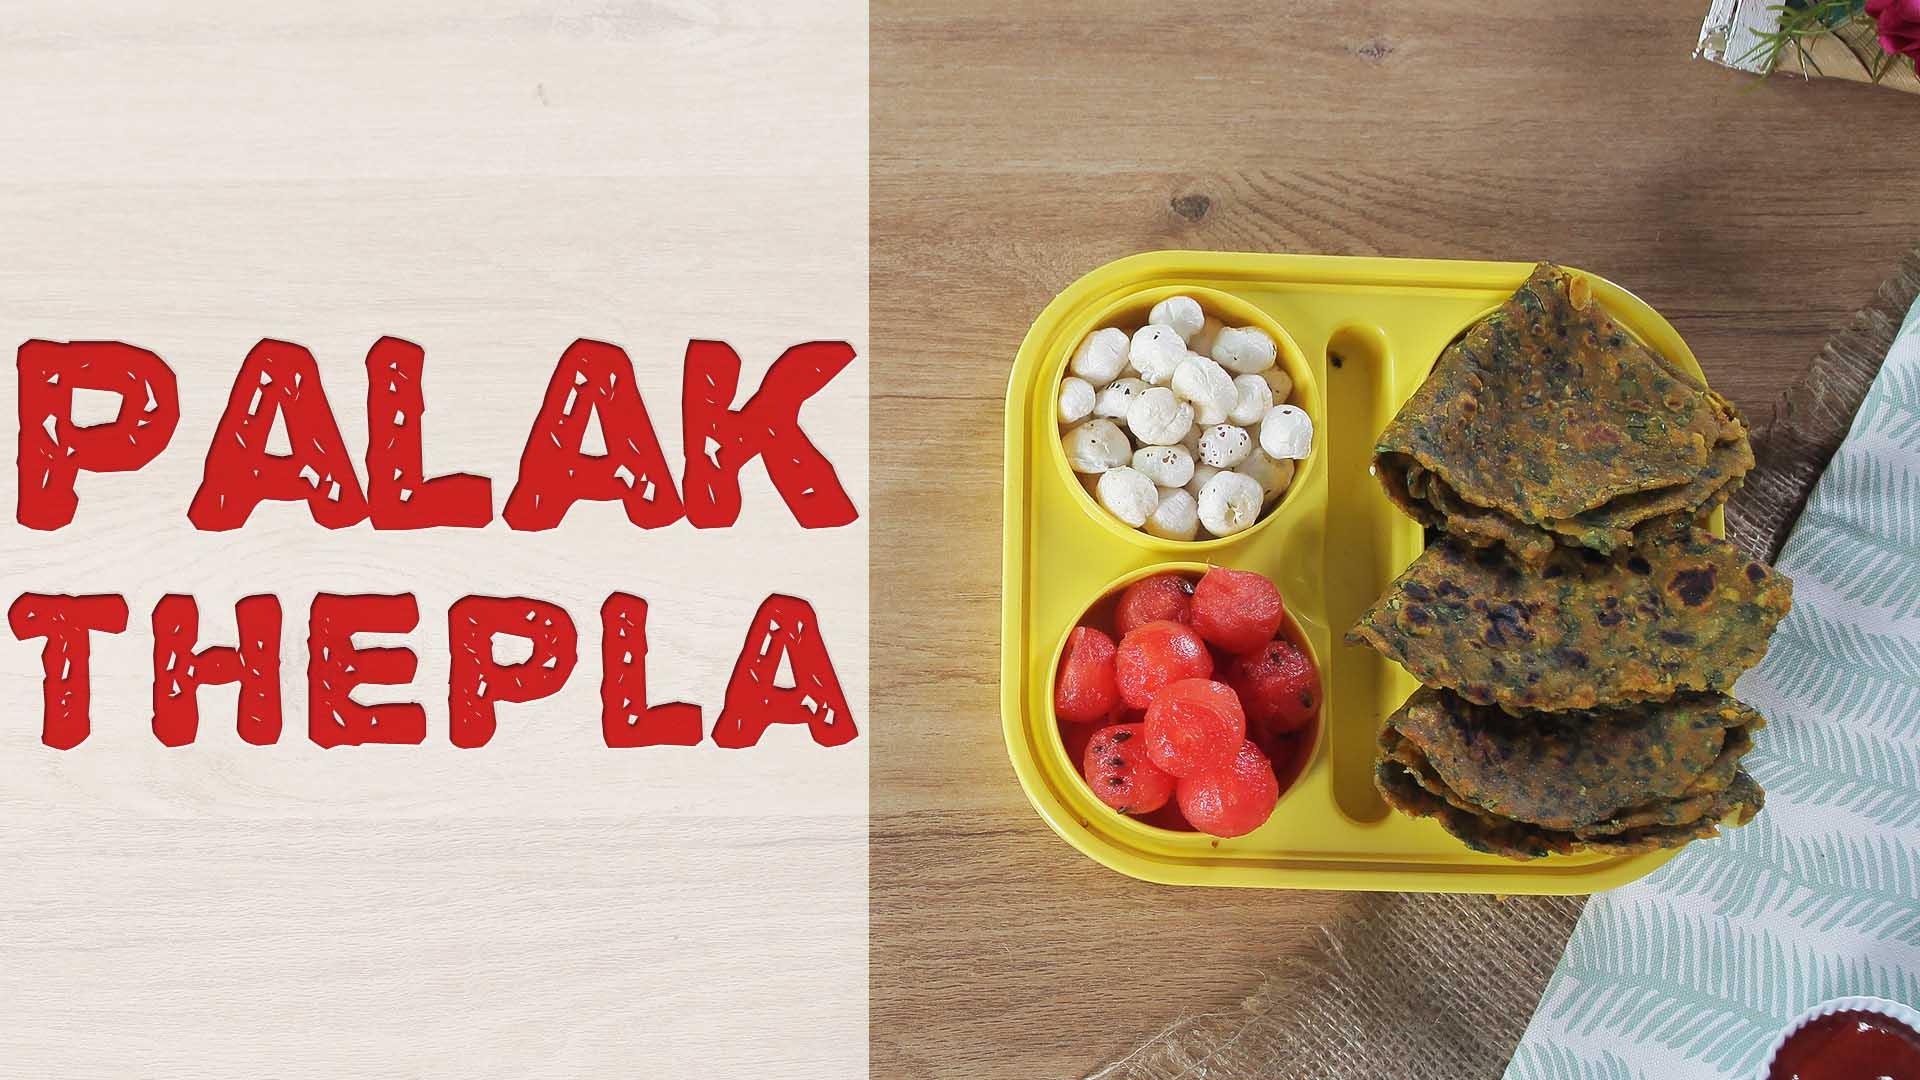 How To Make Palak Thepla